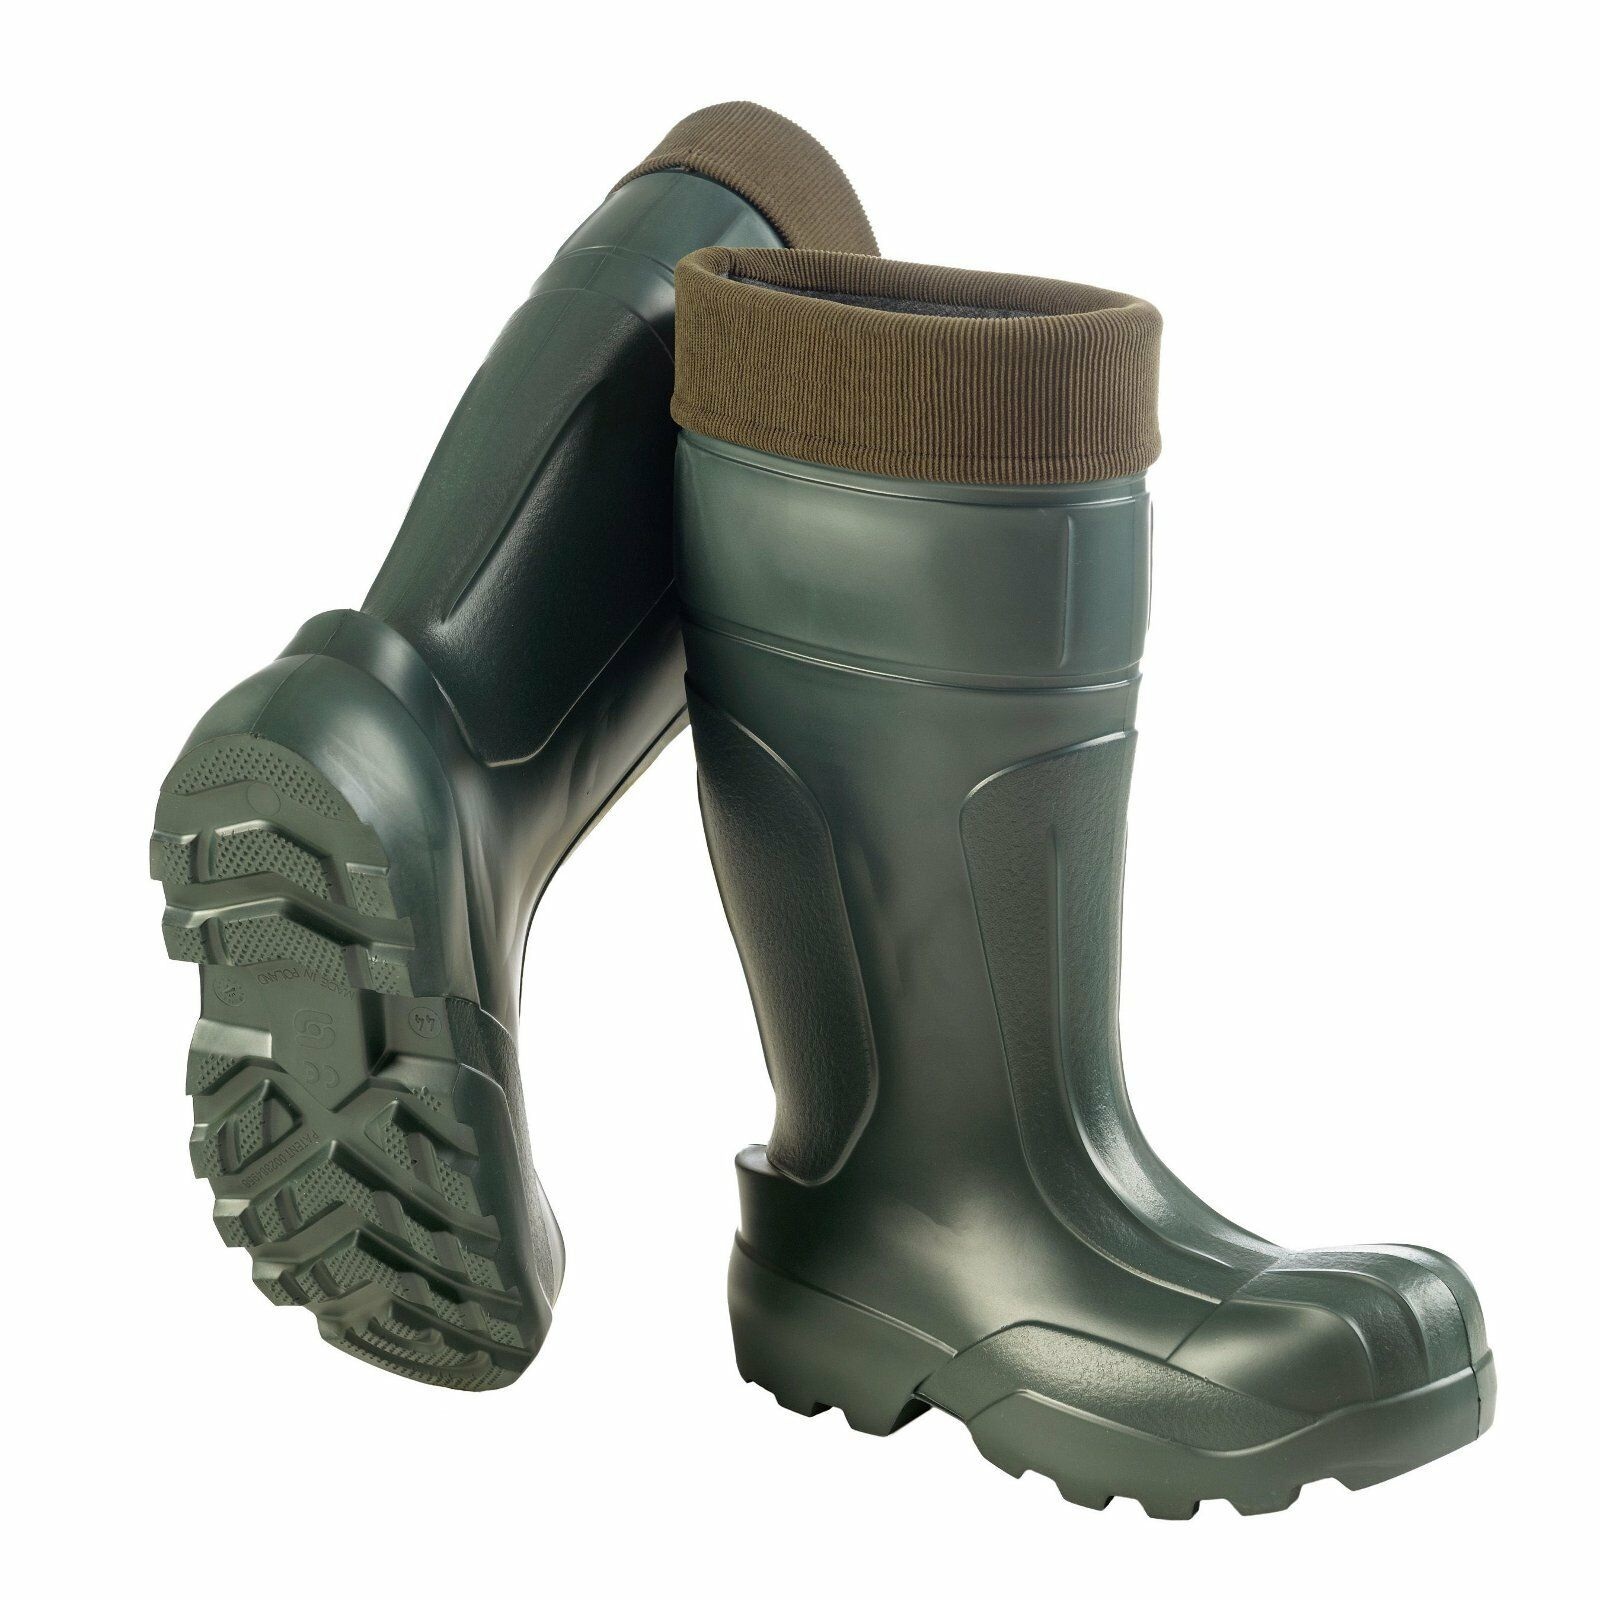 Crosslander Uomo Toronto - verde scarponi invernali Stivali di gomma pesca